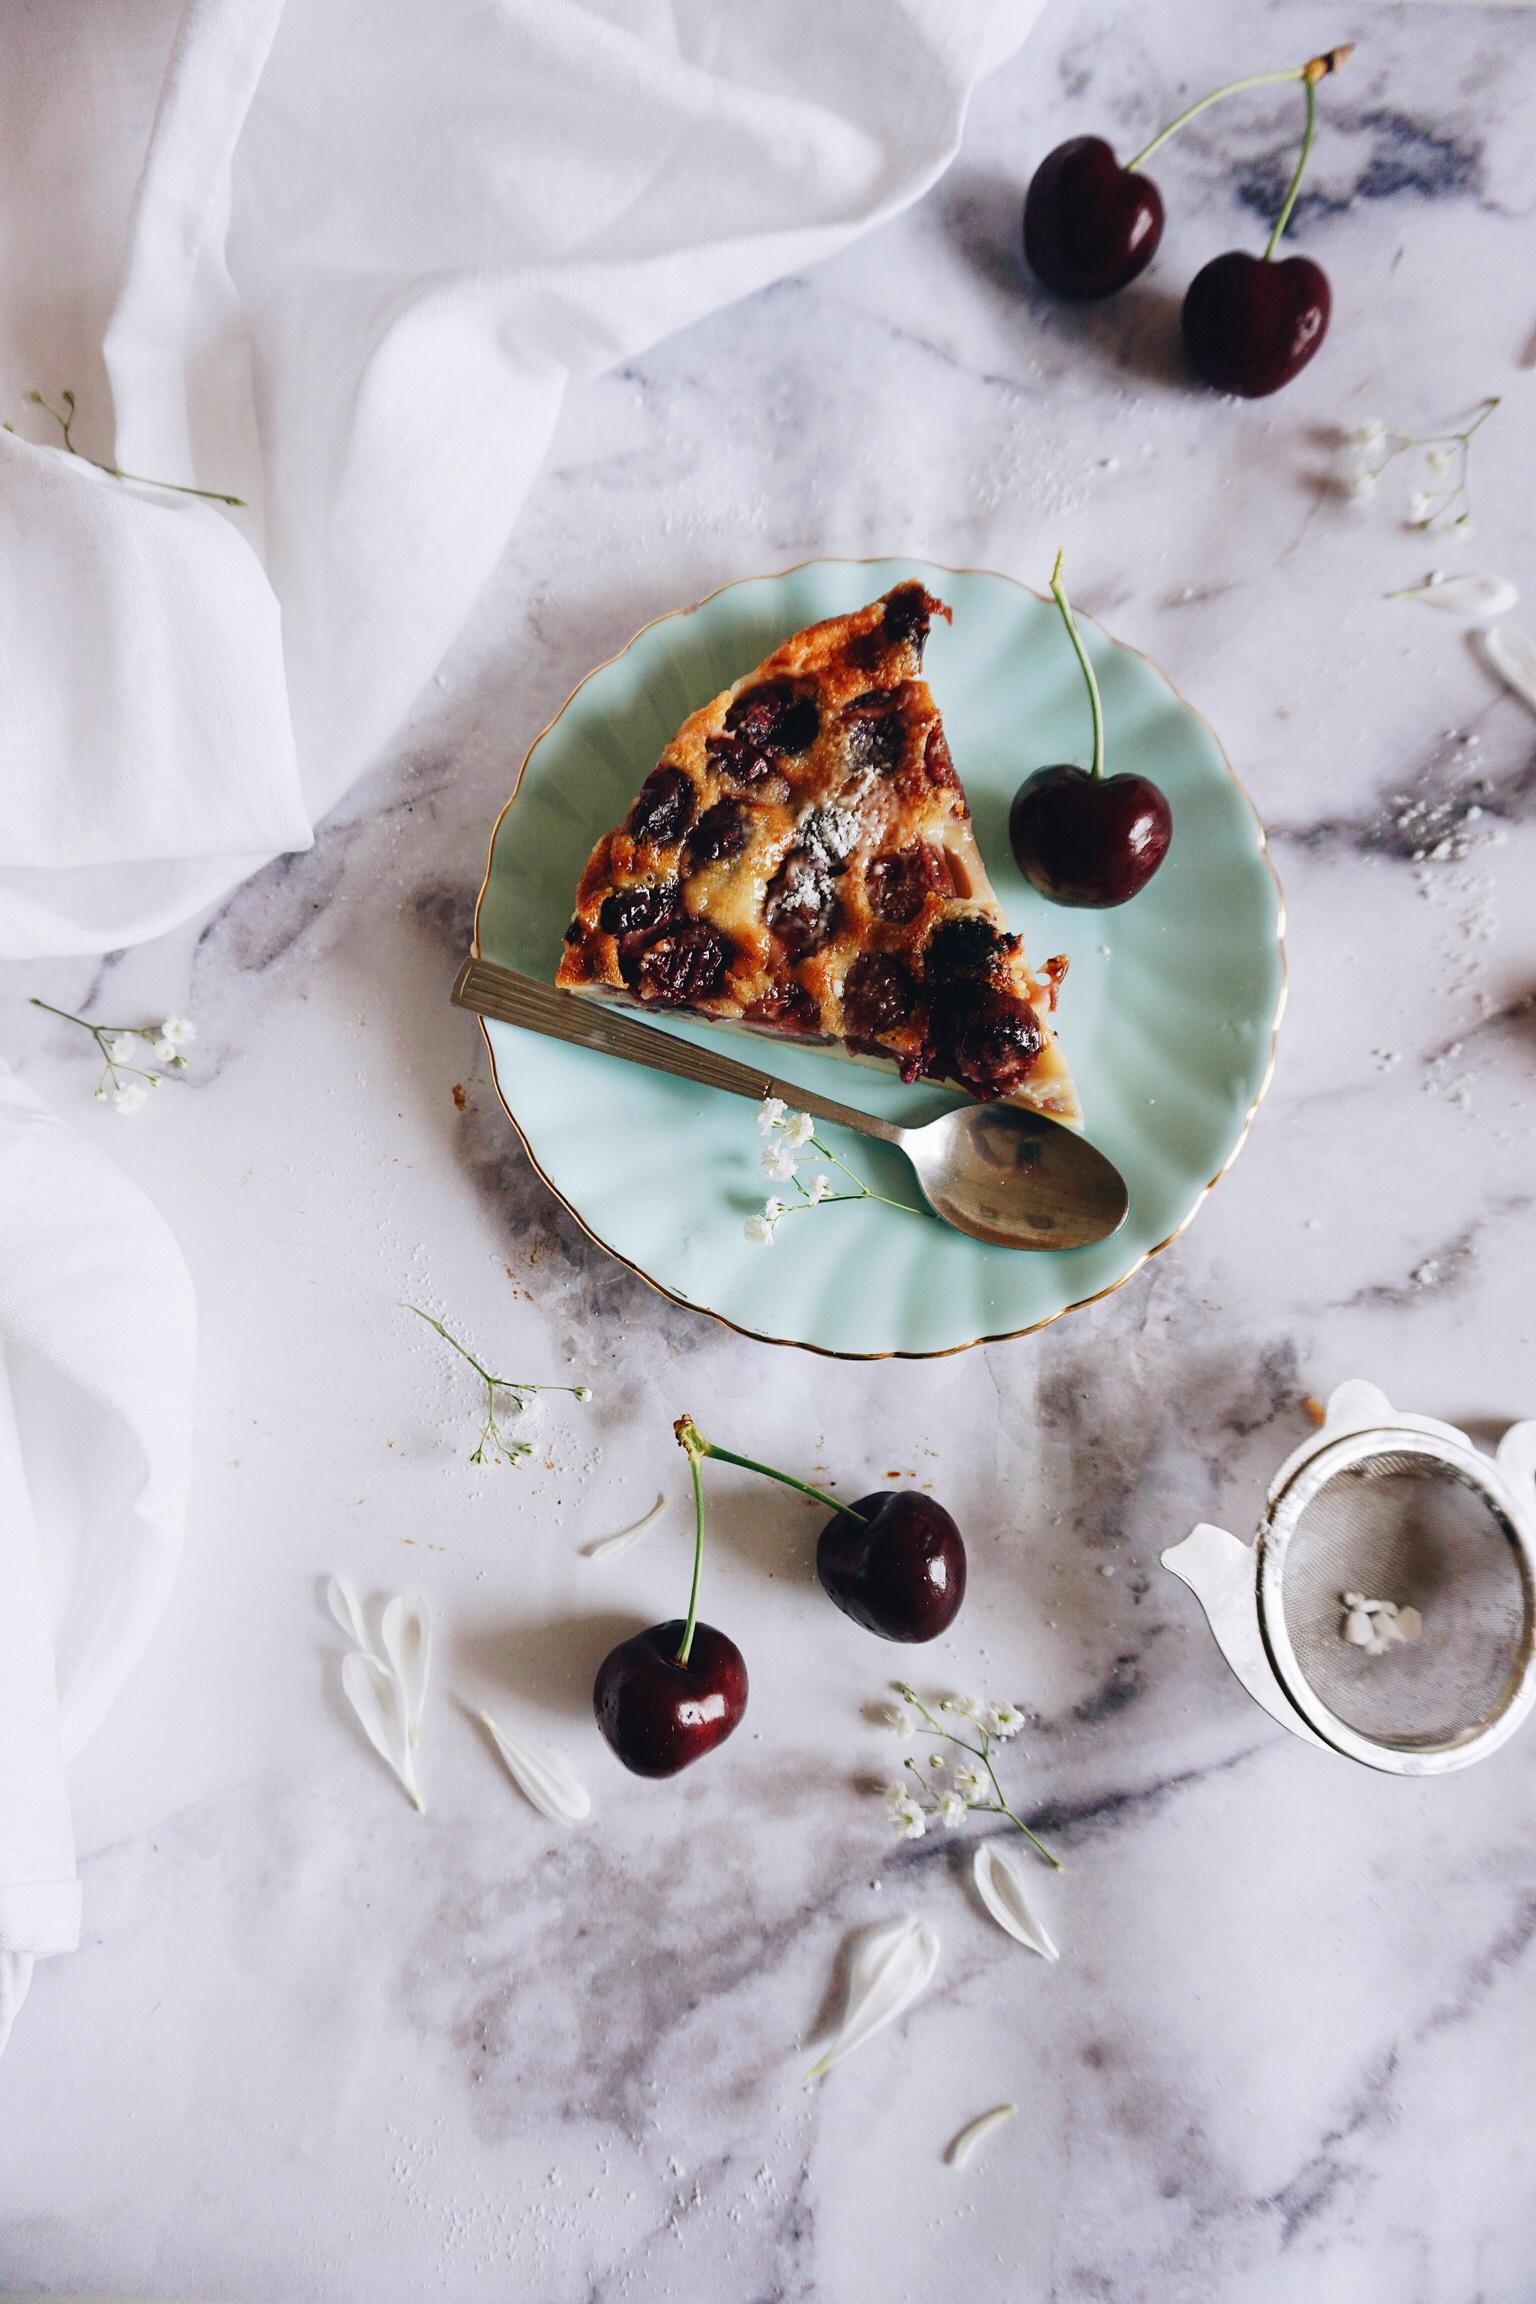 wedge of French cherry custard dessert known as clafoutis served with fresh dark red summer cherries